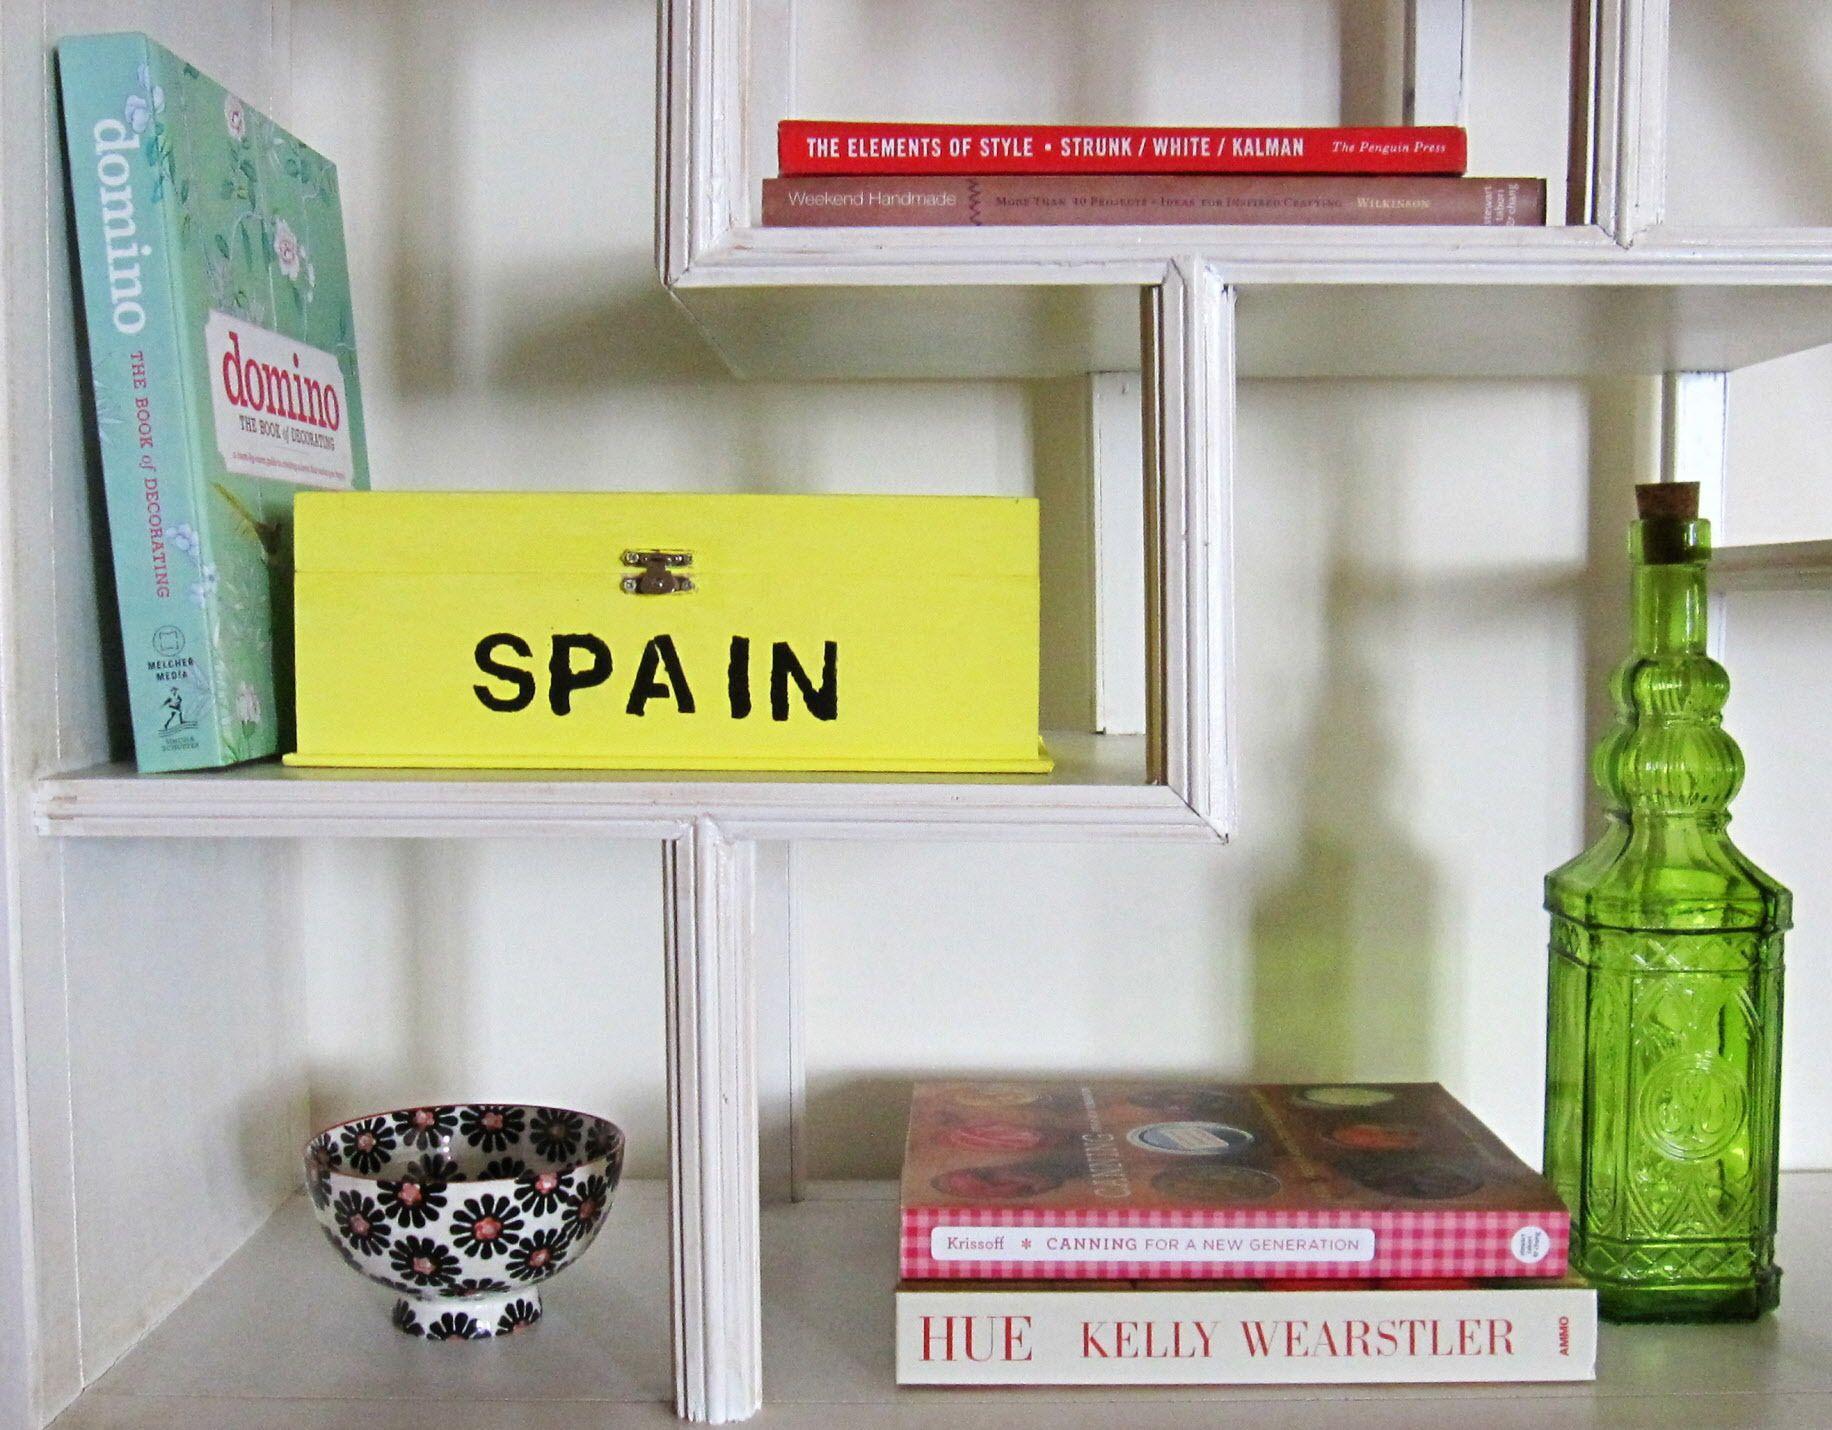 9 creative ways to display vacation souvenirs | Souvenir, Wanderlust ...